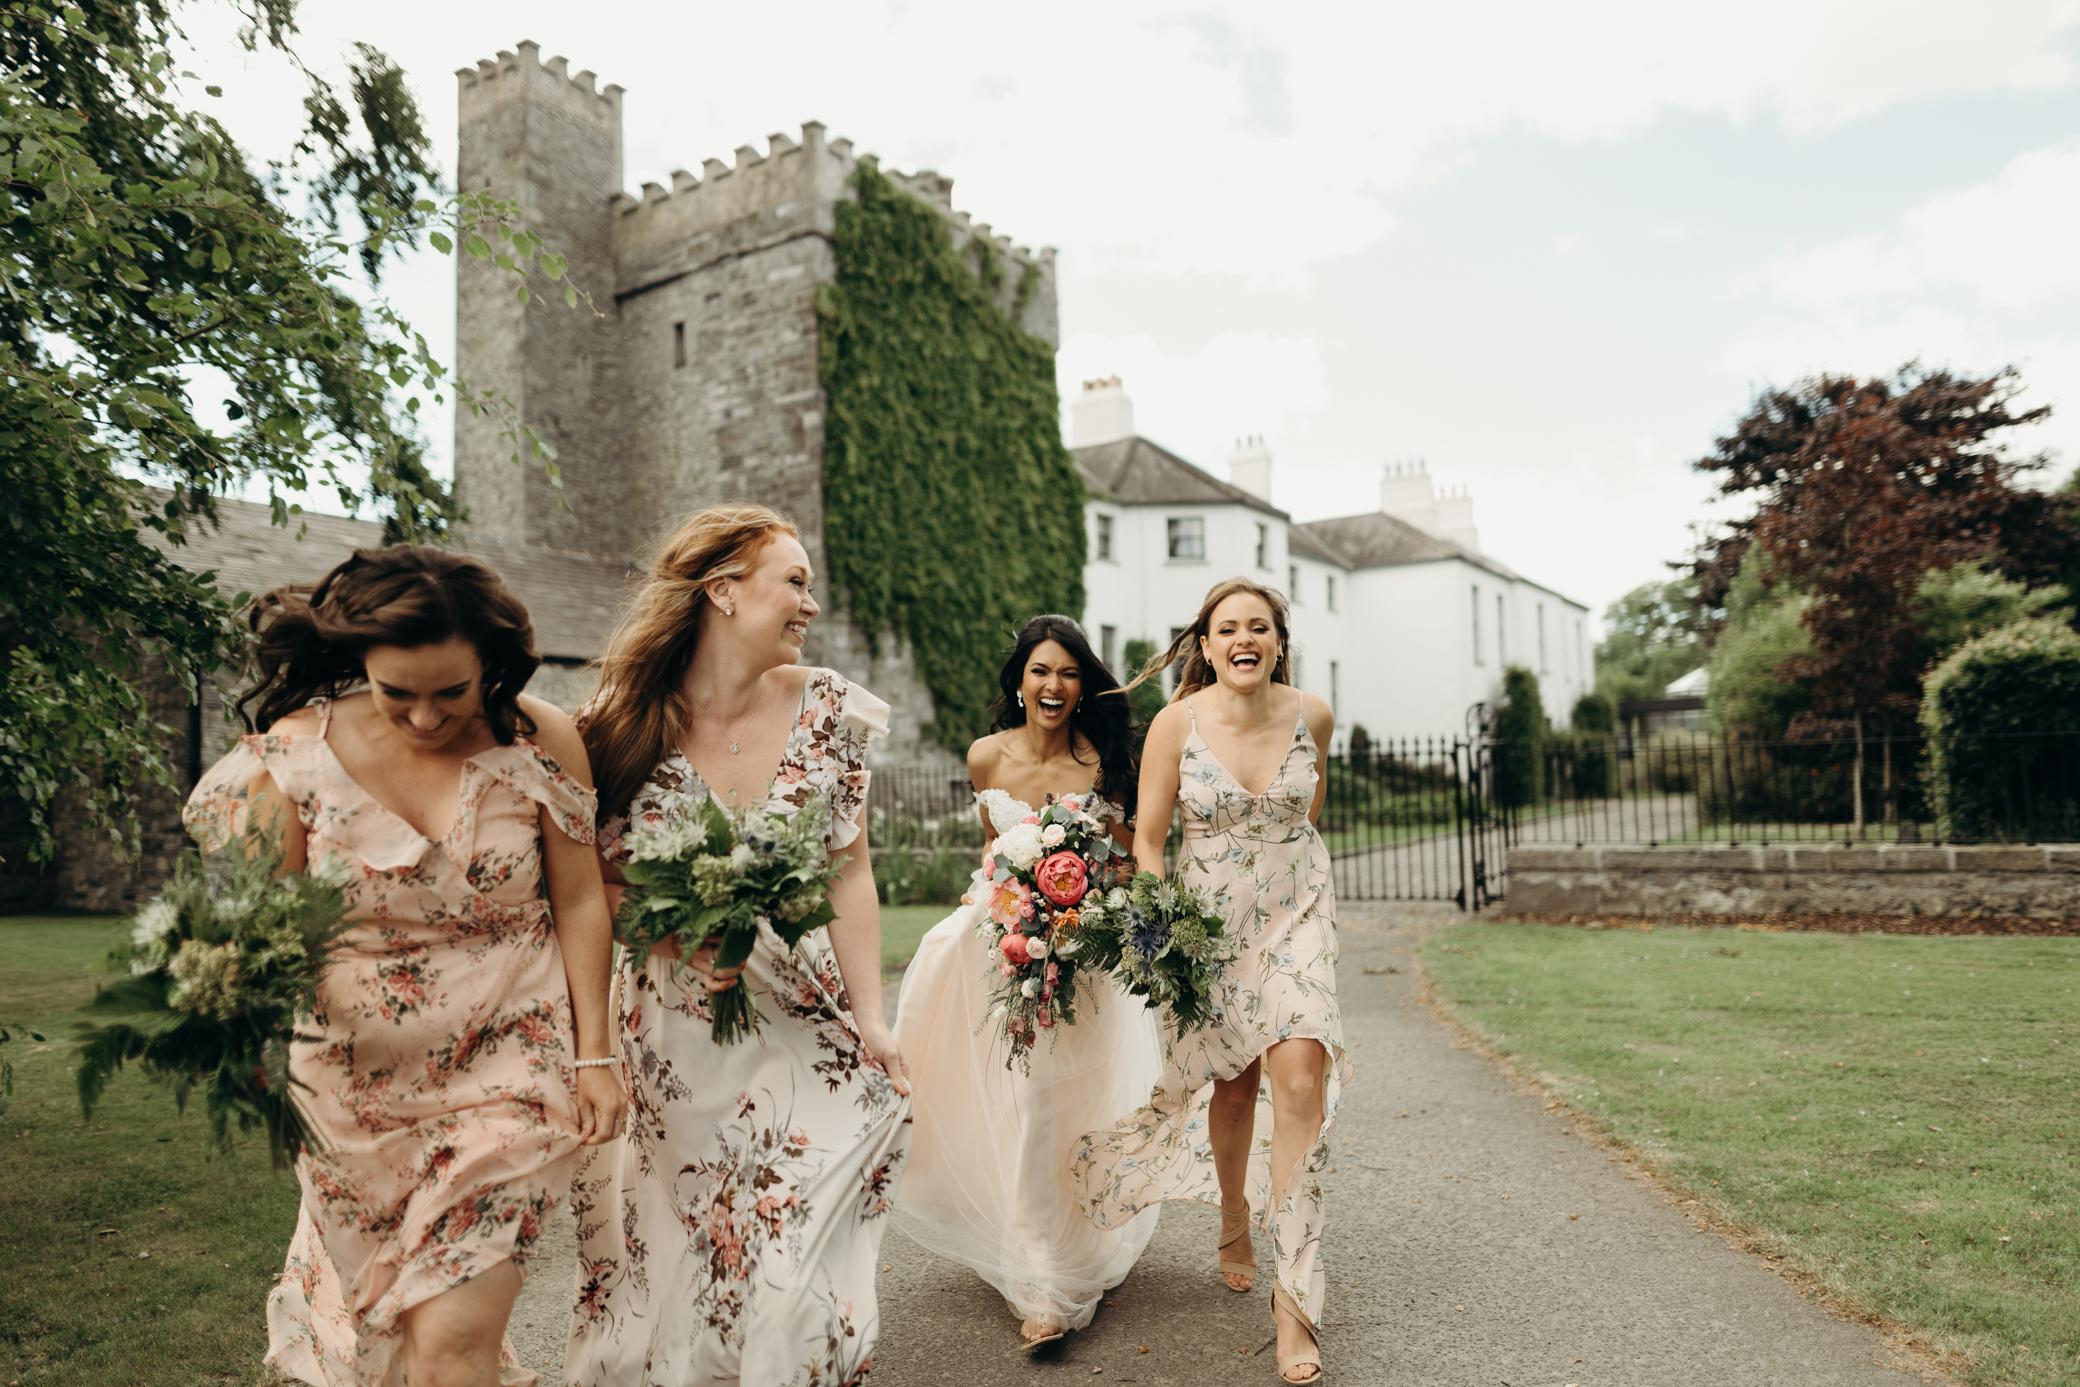 Alan&Naz- Barberstown Castle Wedding - Wedding photographer Ireland-112.jpg